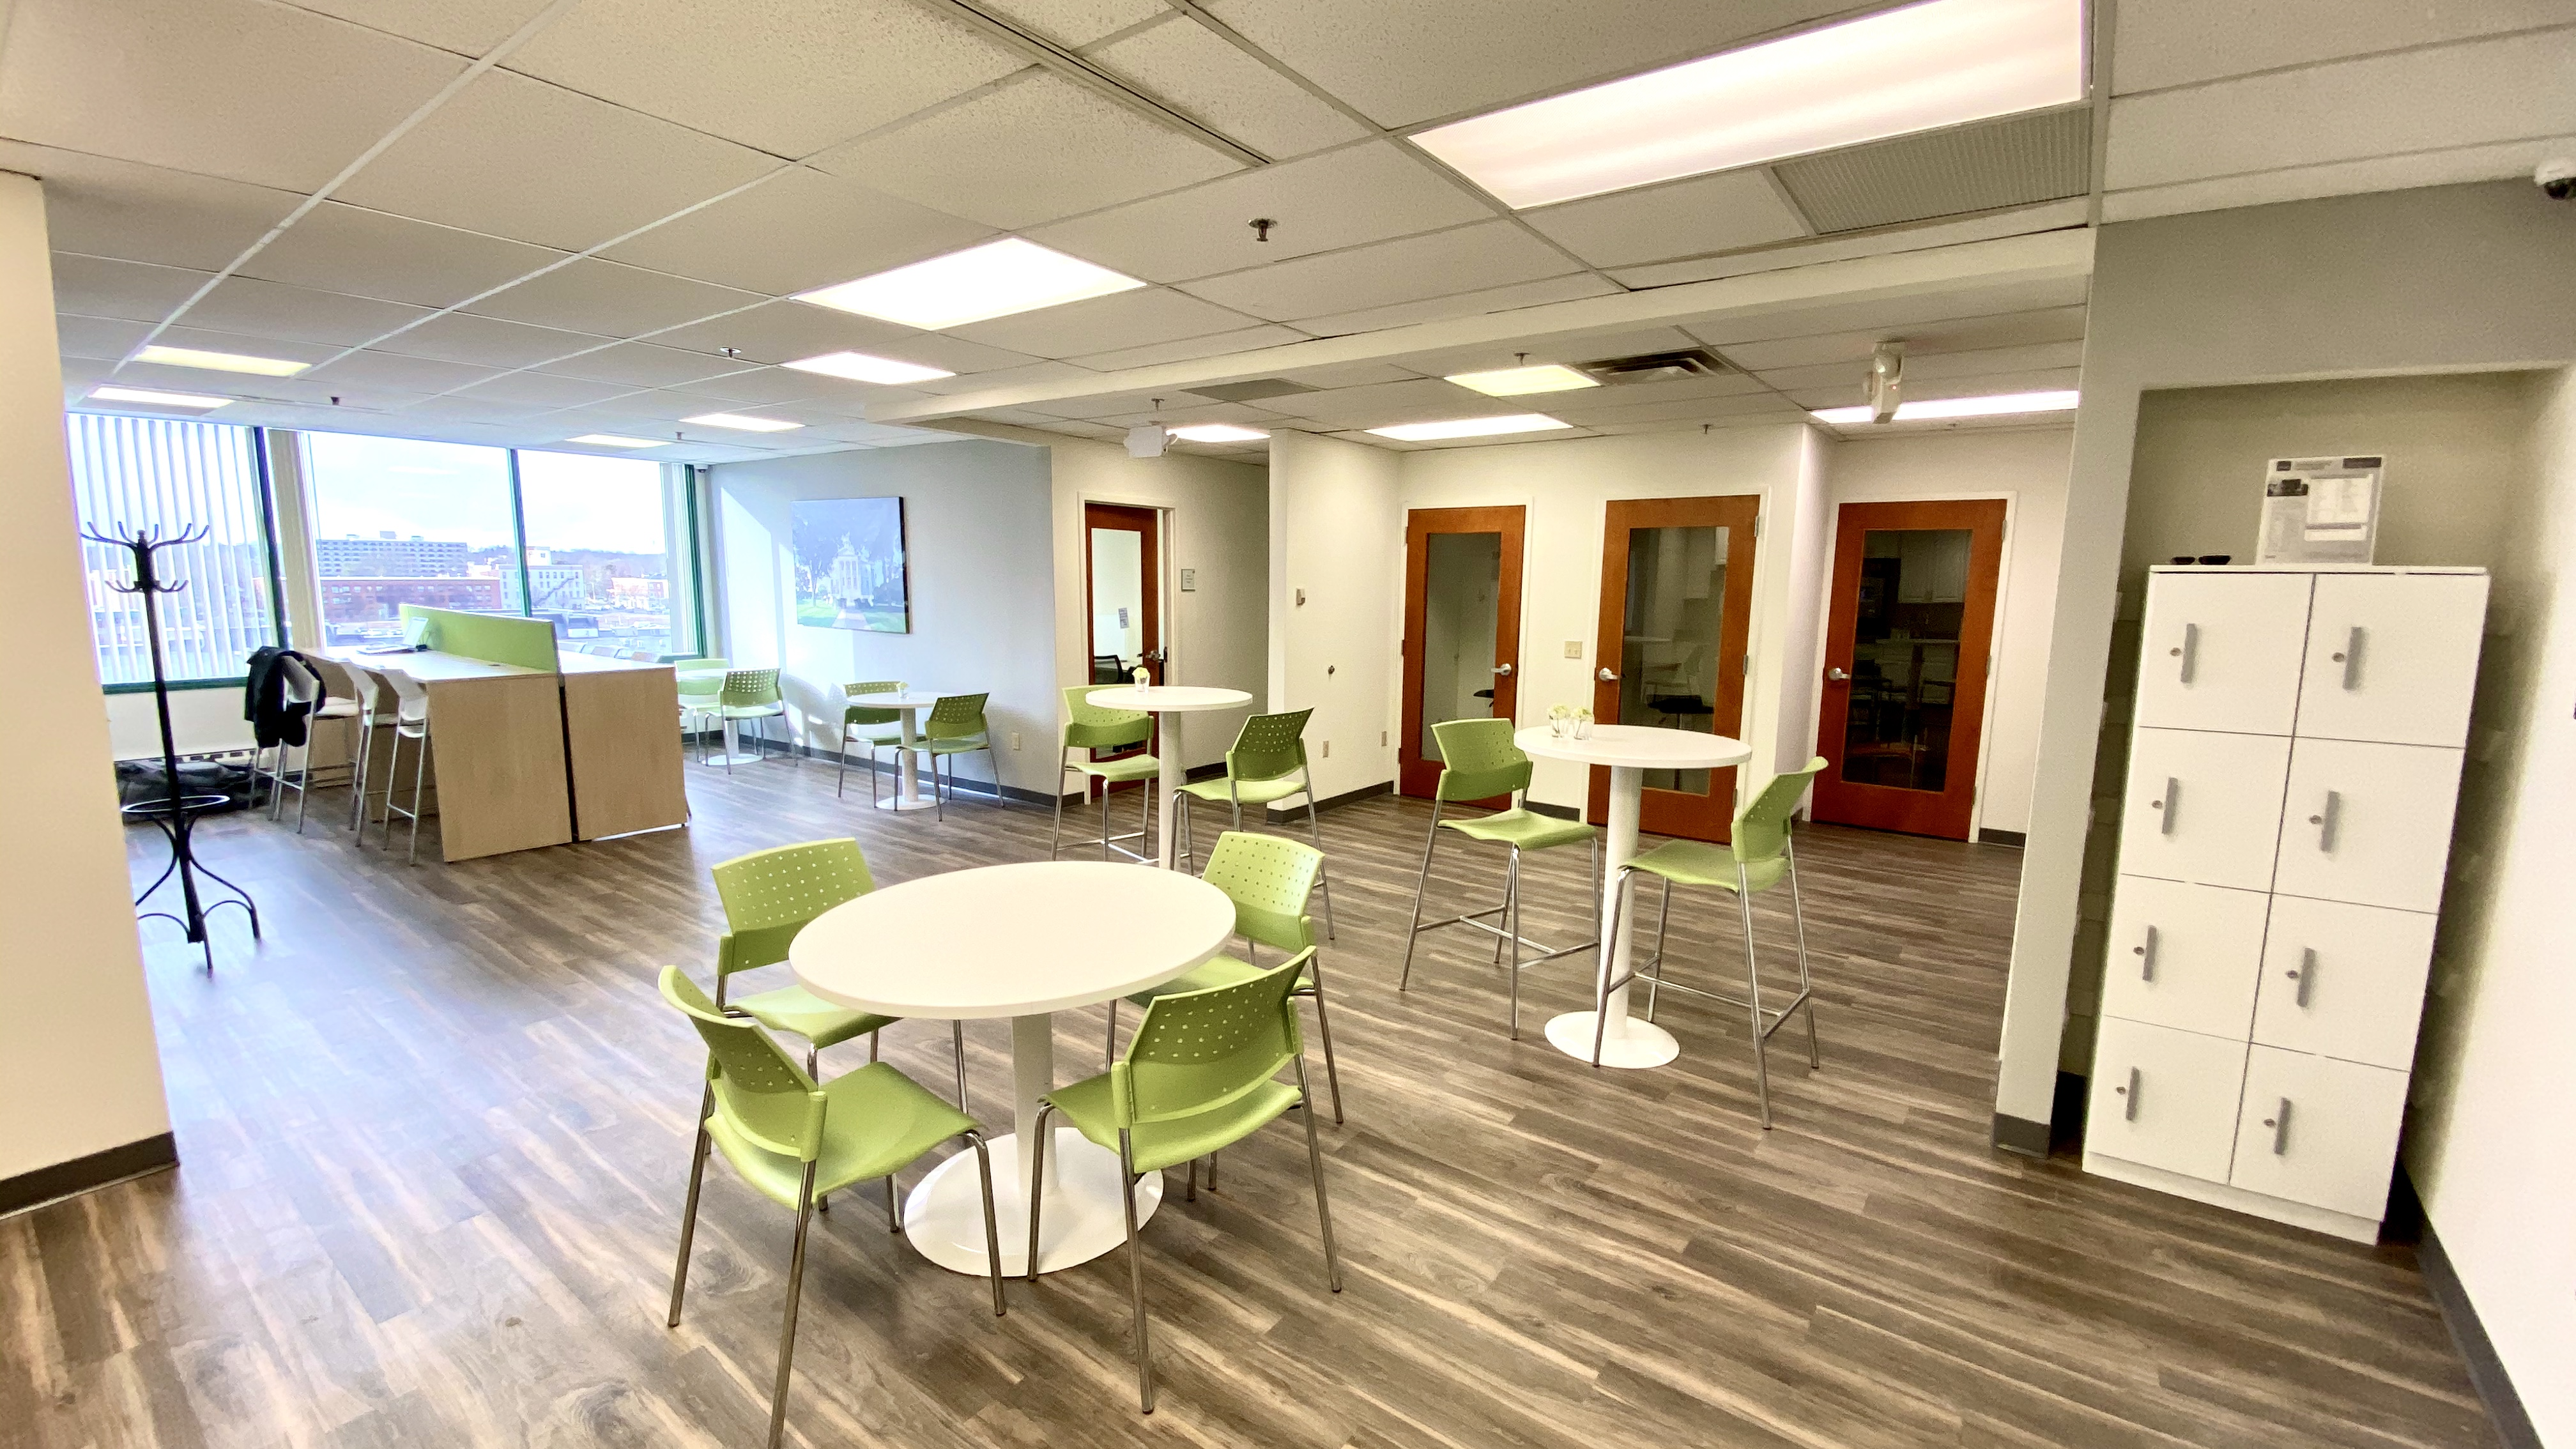 Office Evolution - Somerville, NJ reviews | Shared Office Spaces at 50 Division St Suite 501 - Somerville NJ